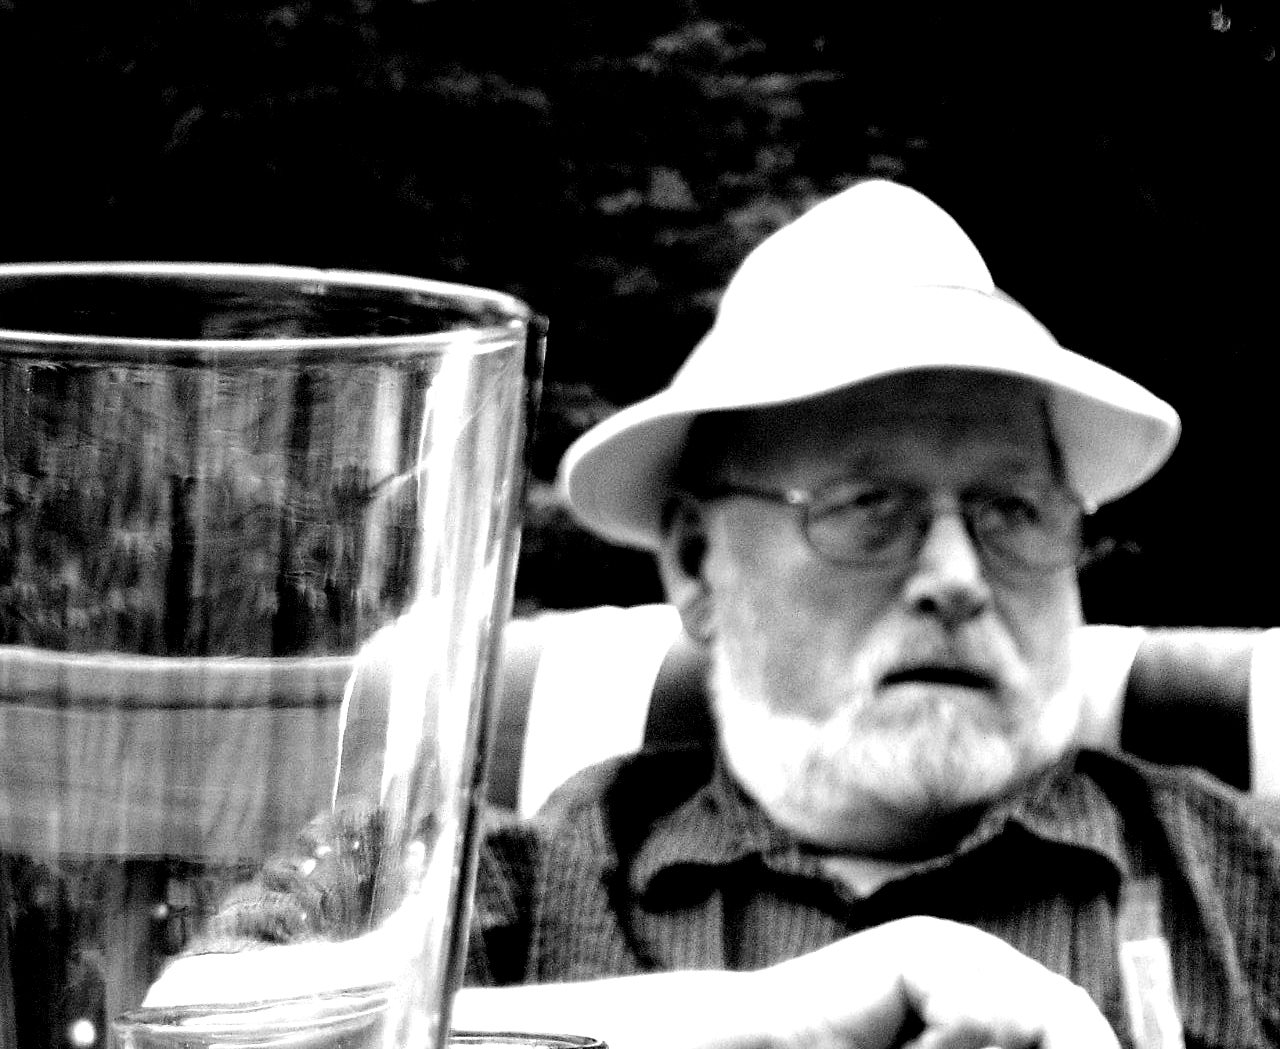 William Kemmett 2009, at Richard Martin's house with Peter Kidd